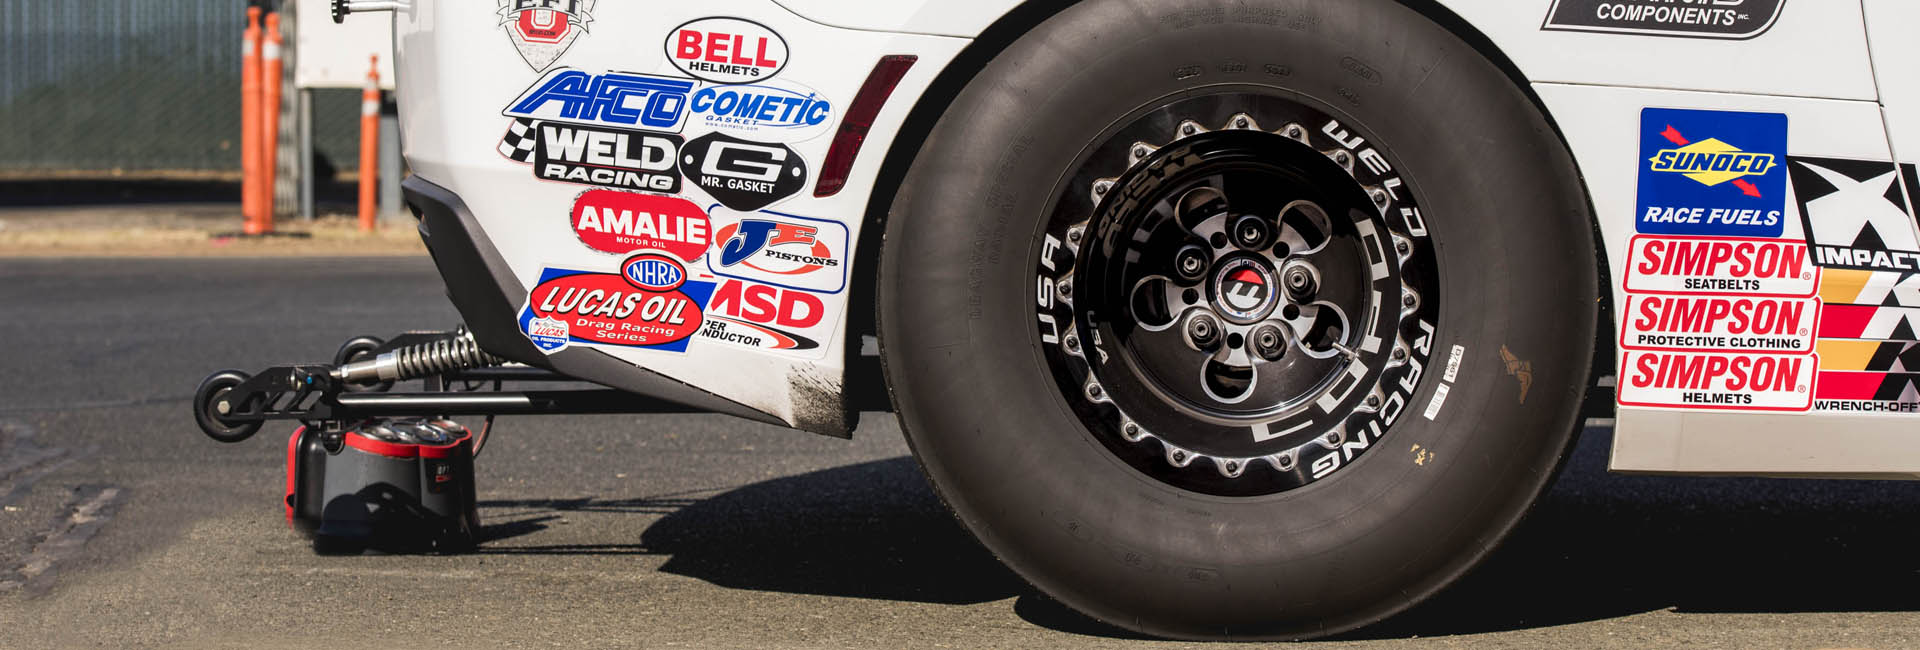 WELD Wheels - Leader in Racing and Maximum Performance Wheels